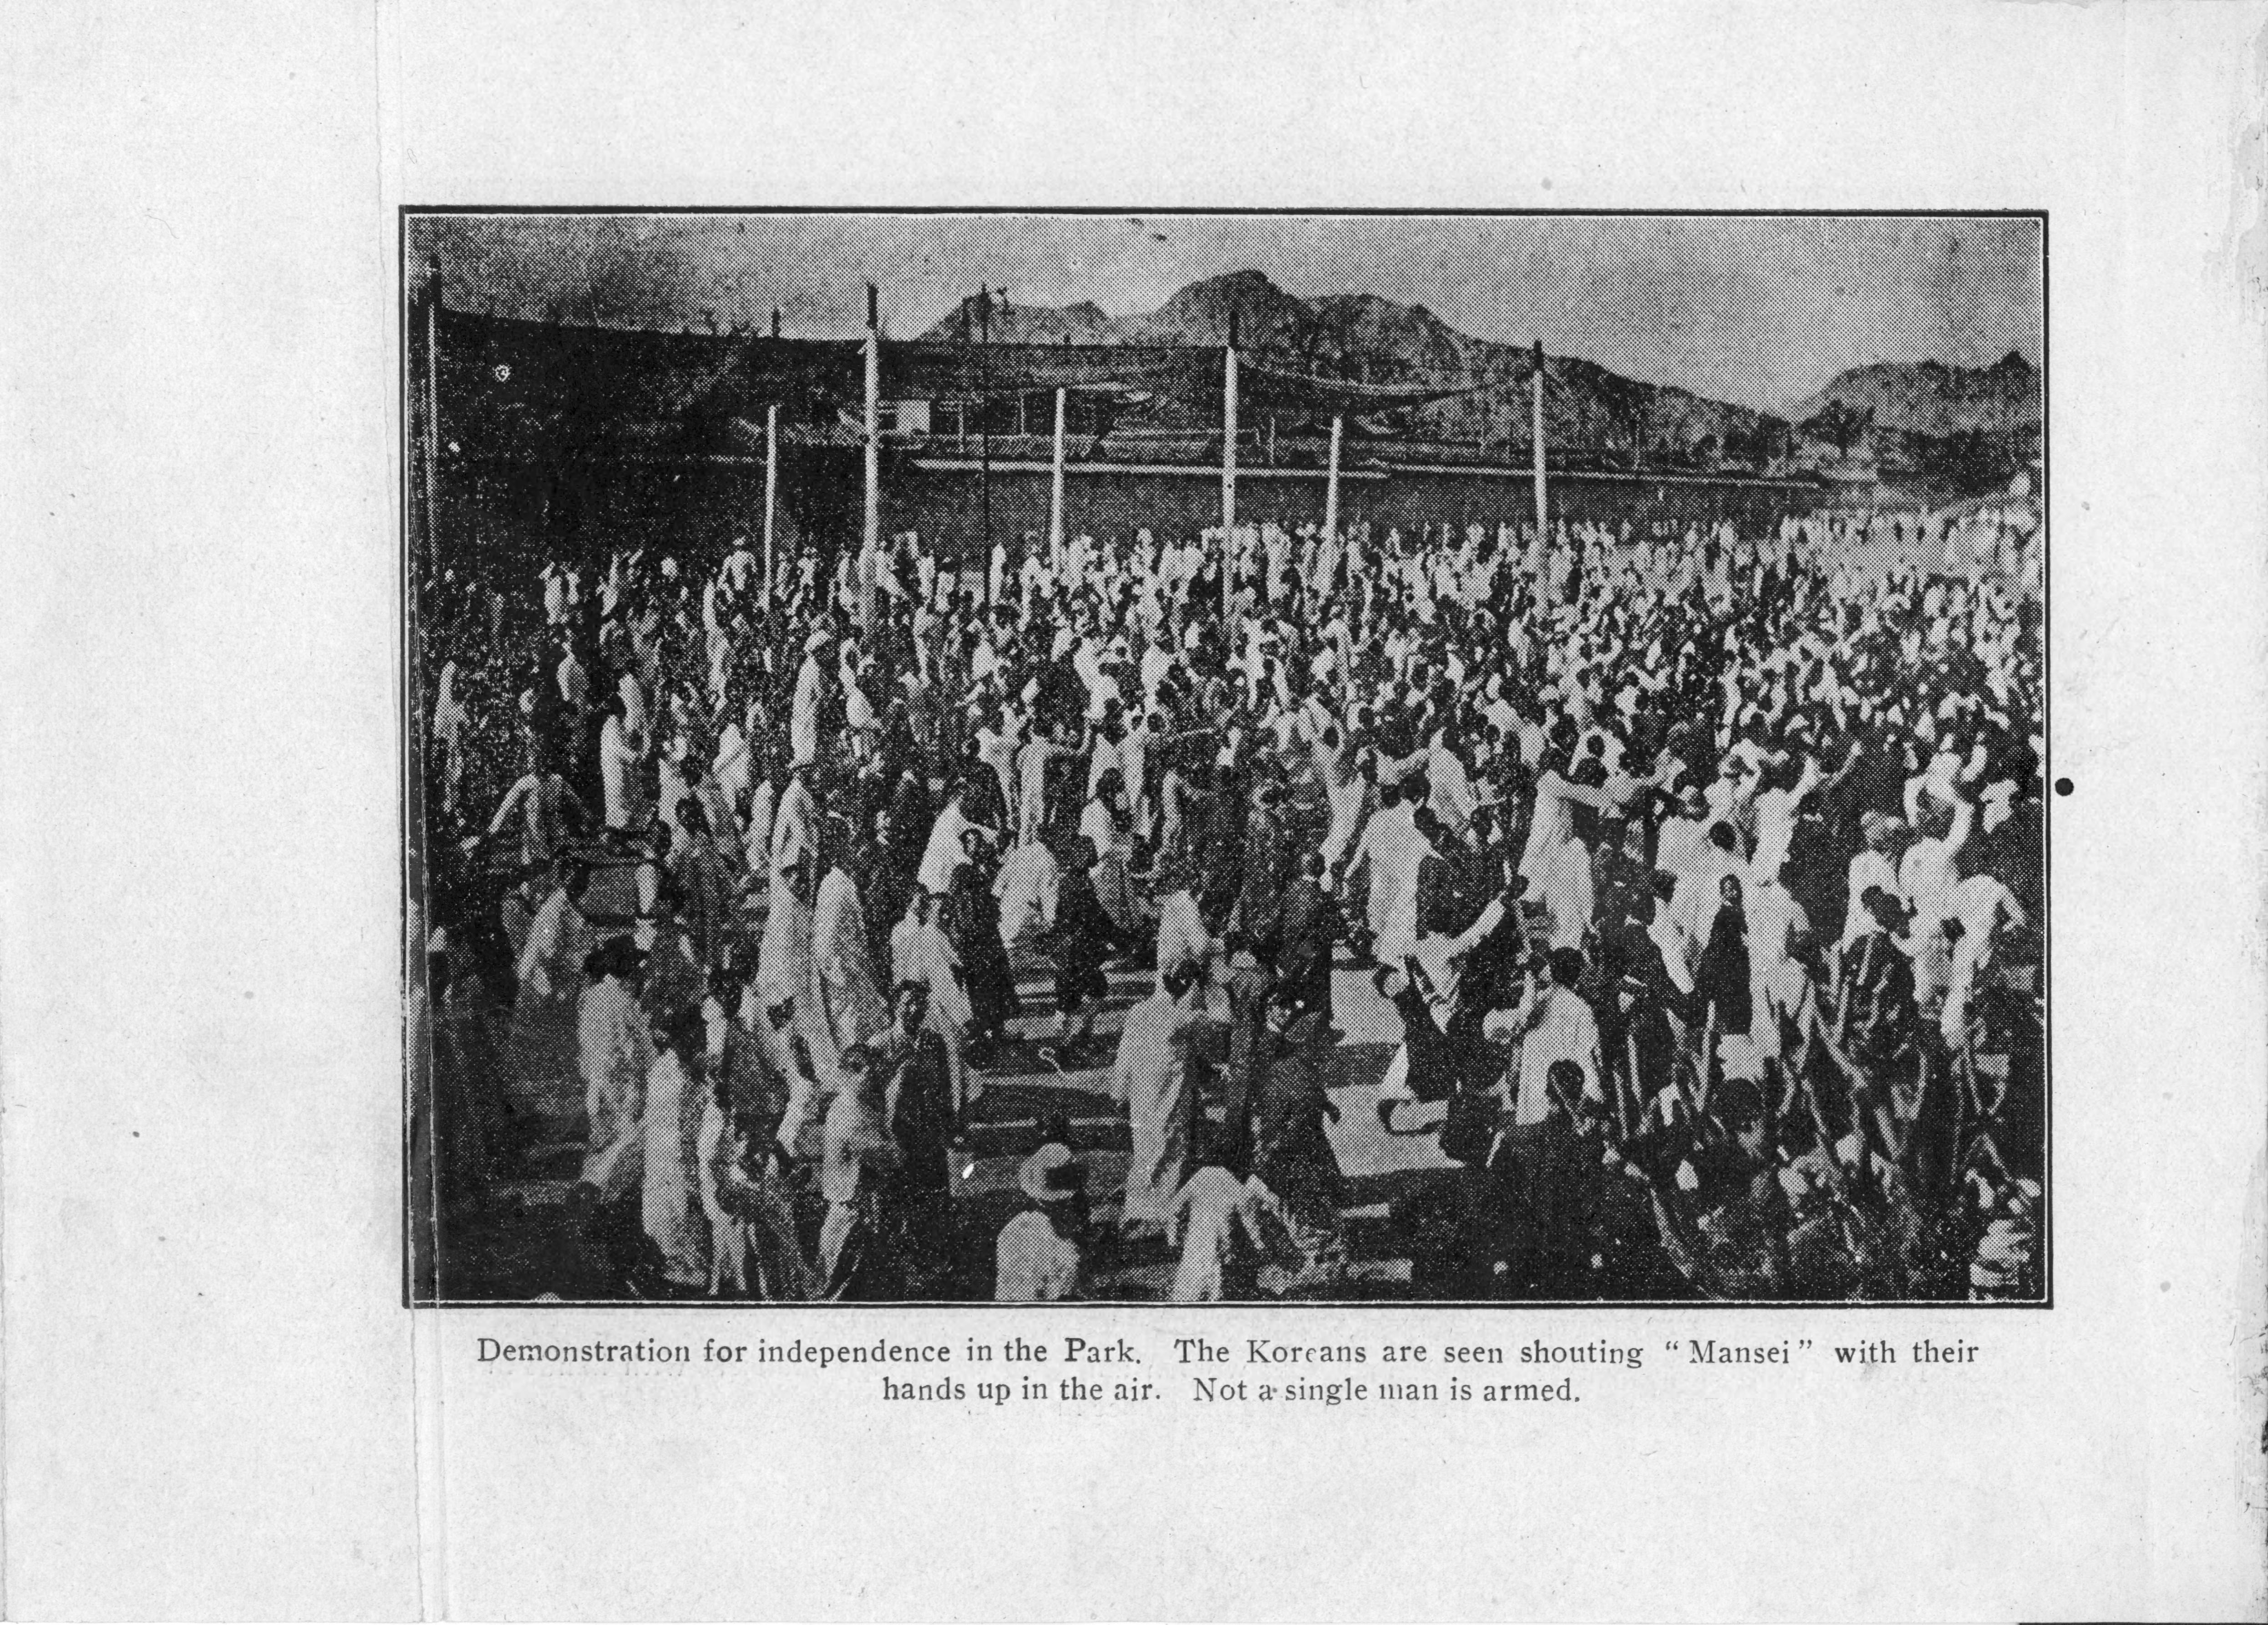 (Red_Cross_pamphlet_on_March_1st_Movement)_(KADA-shyun15-012-12)